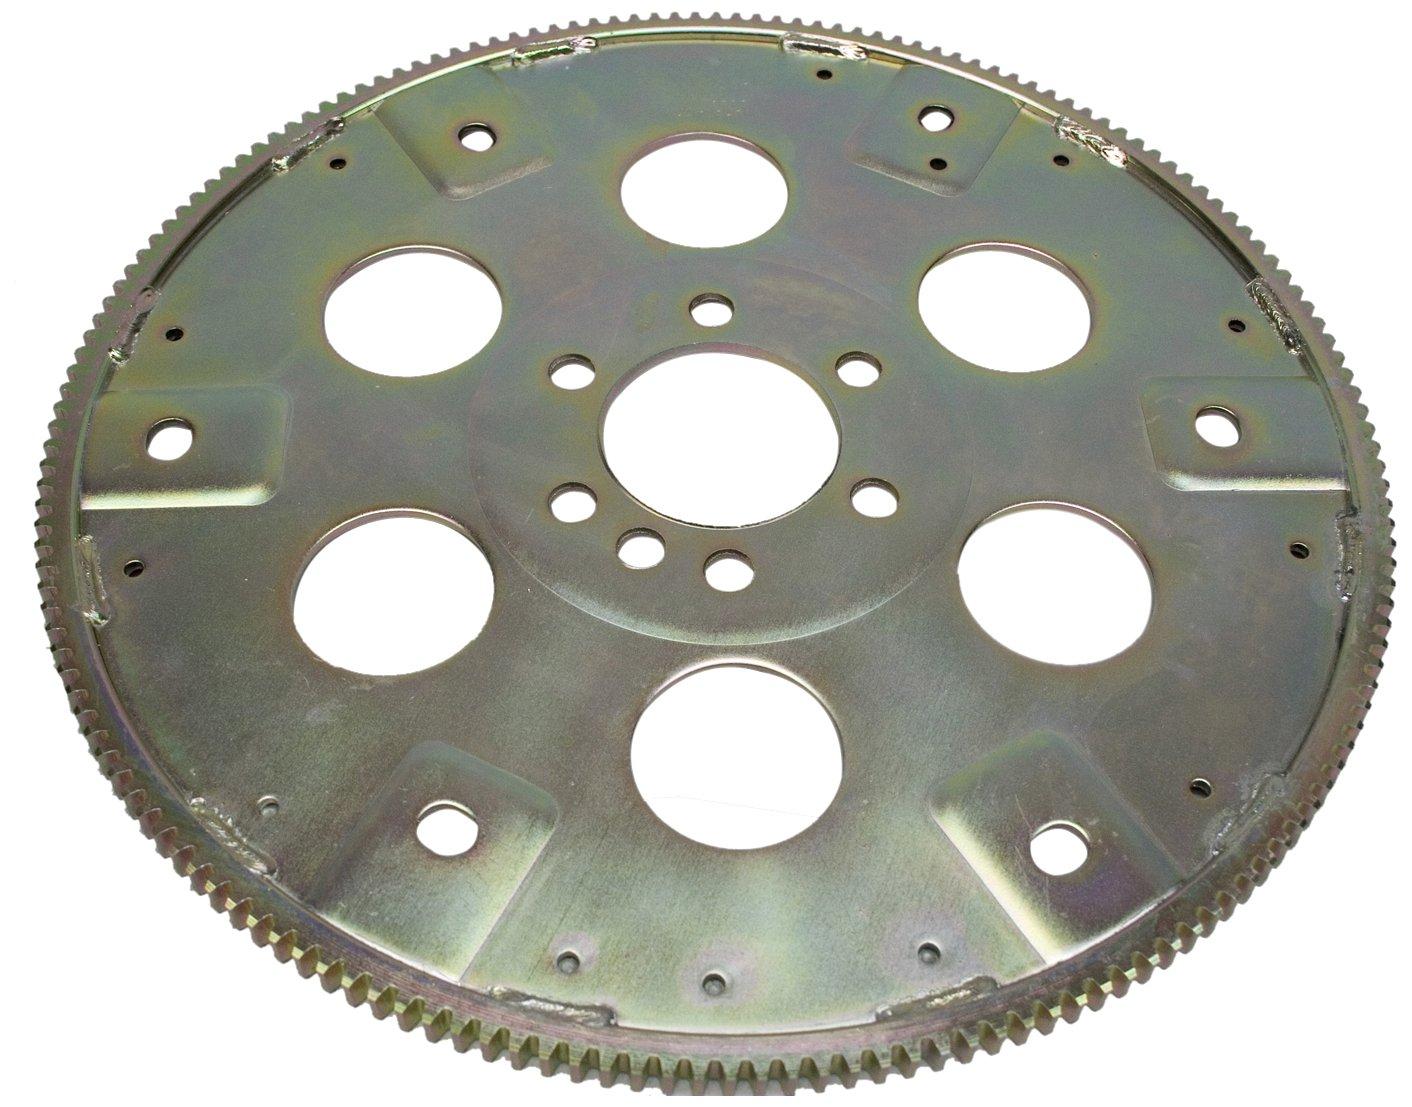 PRW 1840000 SFI-Rated External Balance 168 Teeth Chromoly Steel Flexplate for Chevy 400/383 1970-80 Early